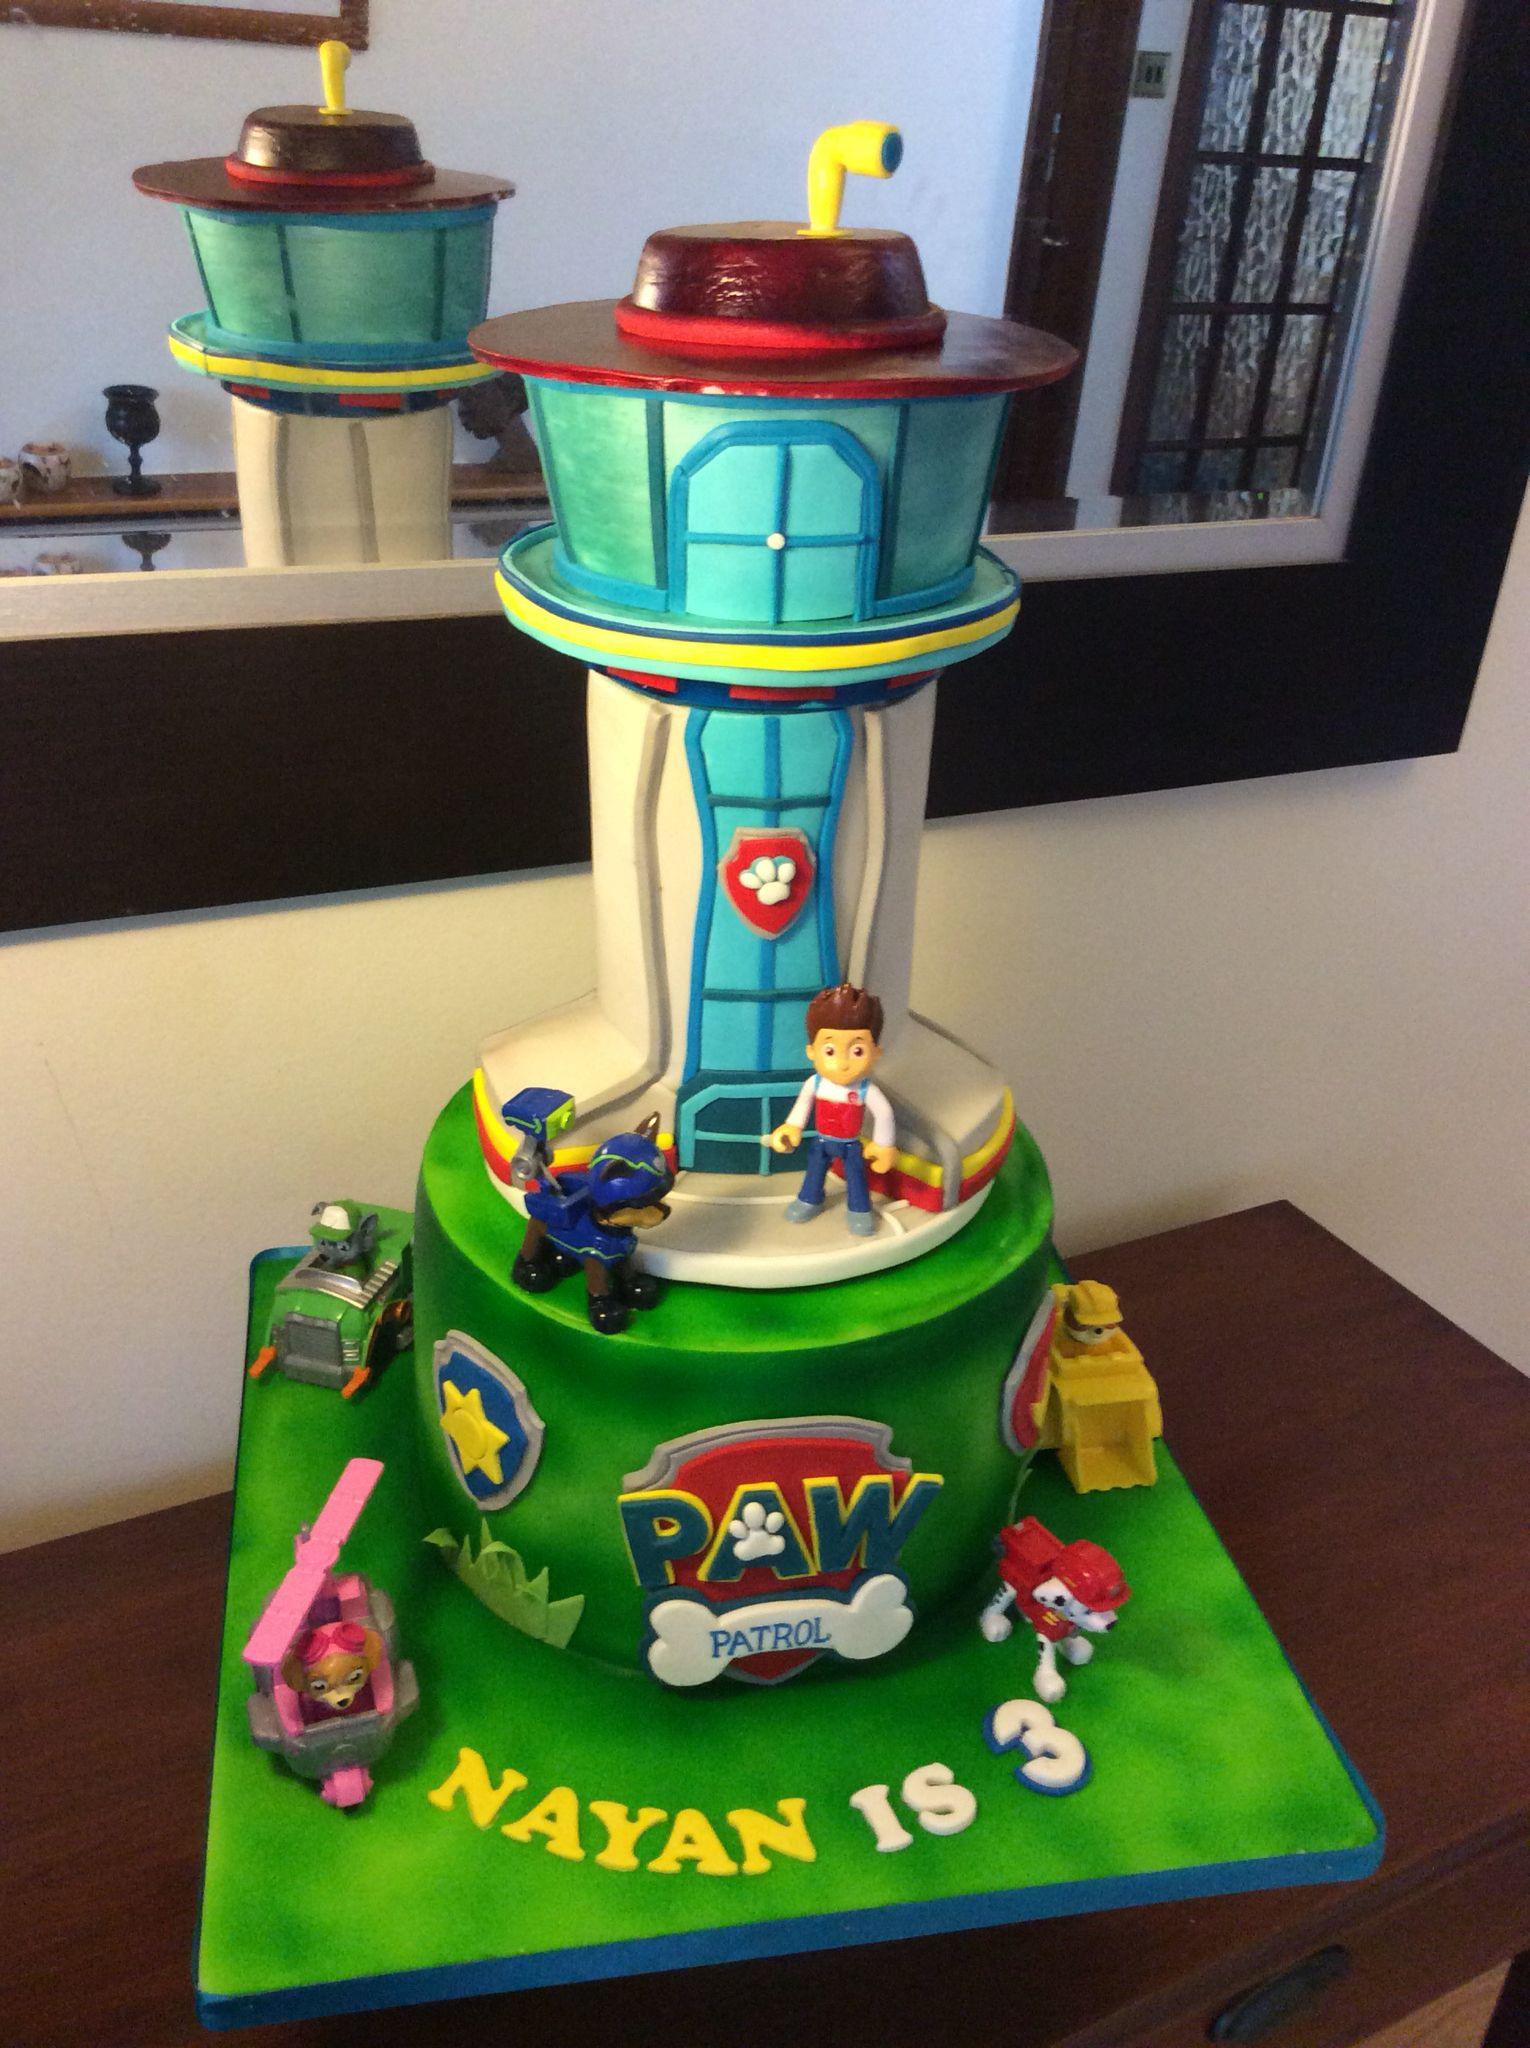 Superb Paw Patrol Lookout Tower Cake Paw Patrol Cake Paw Patrol Cake Personalised Birthday Cards Beptaeletsinfo